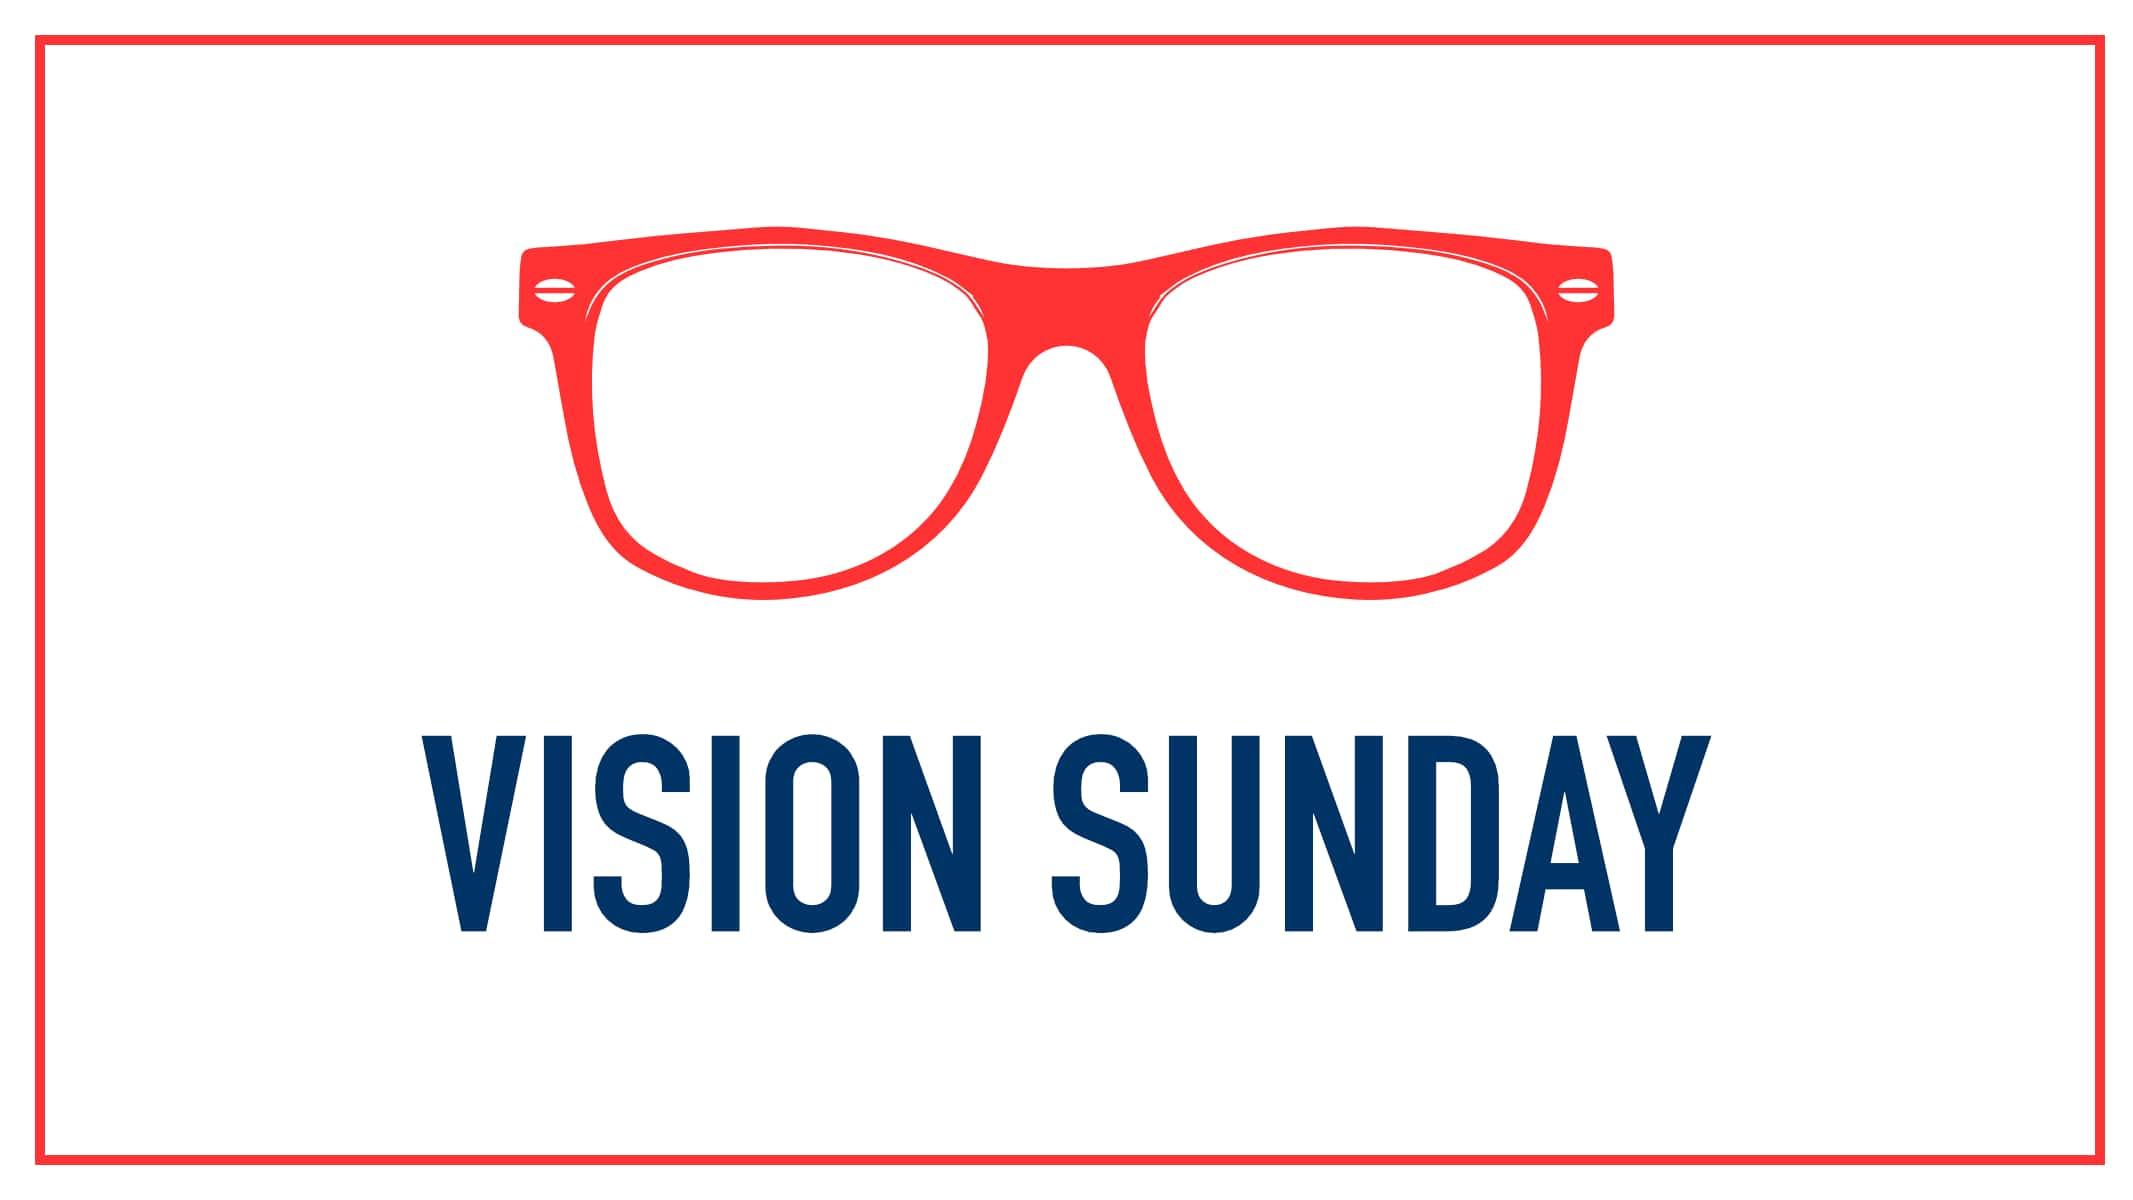 Vision Sunday 2017